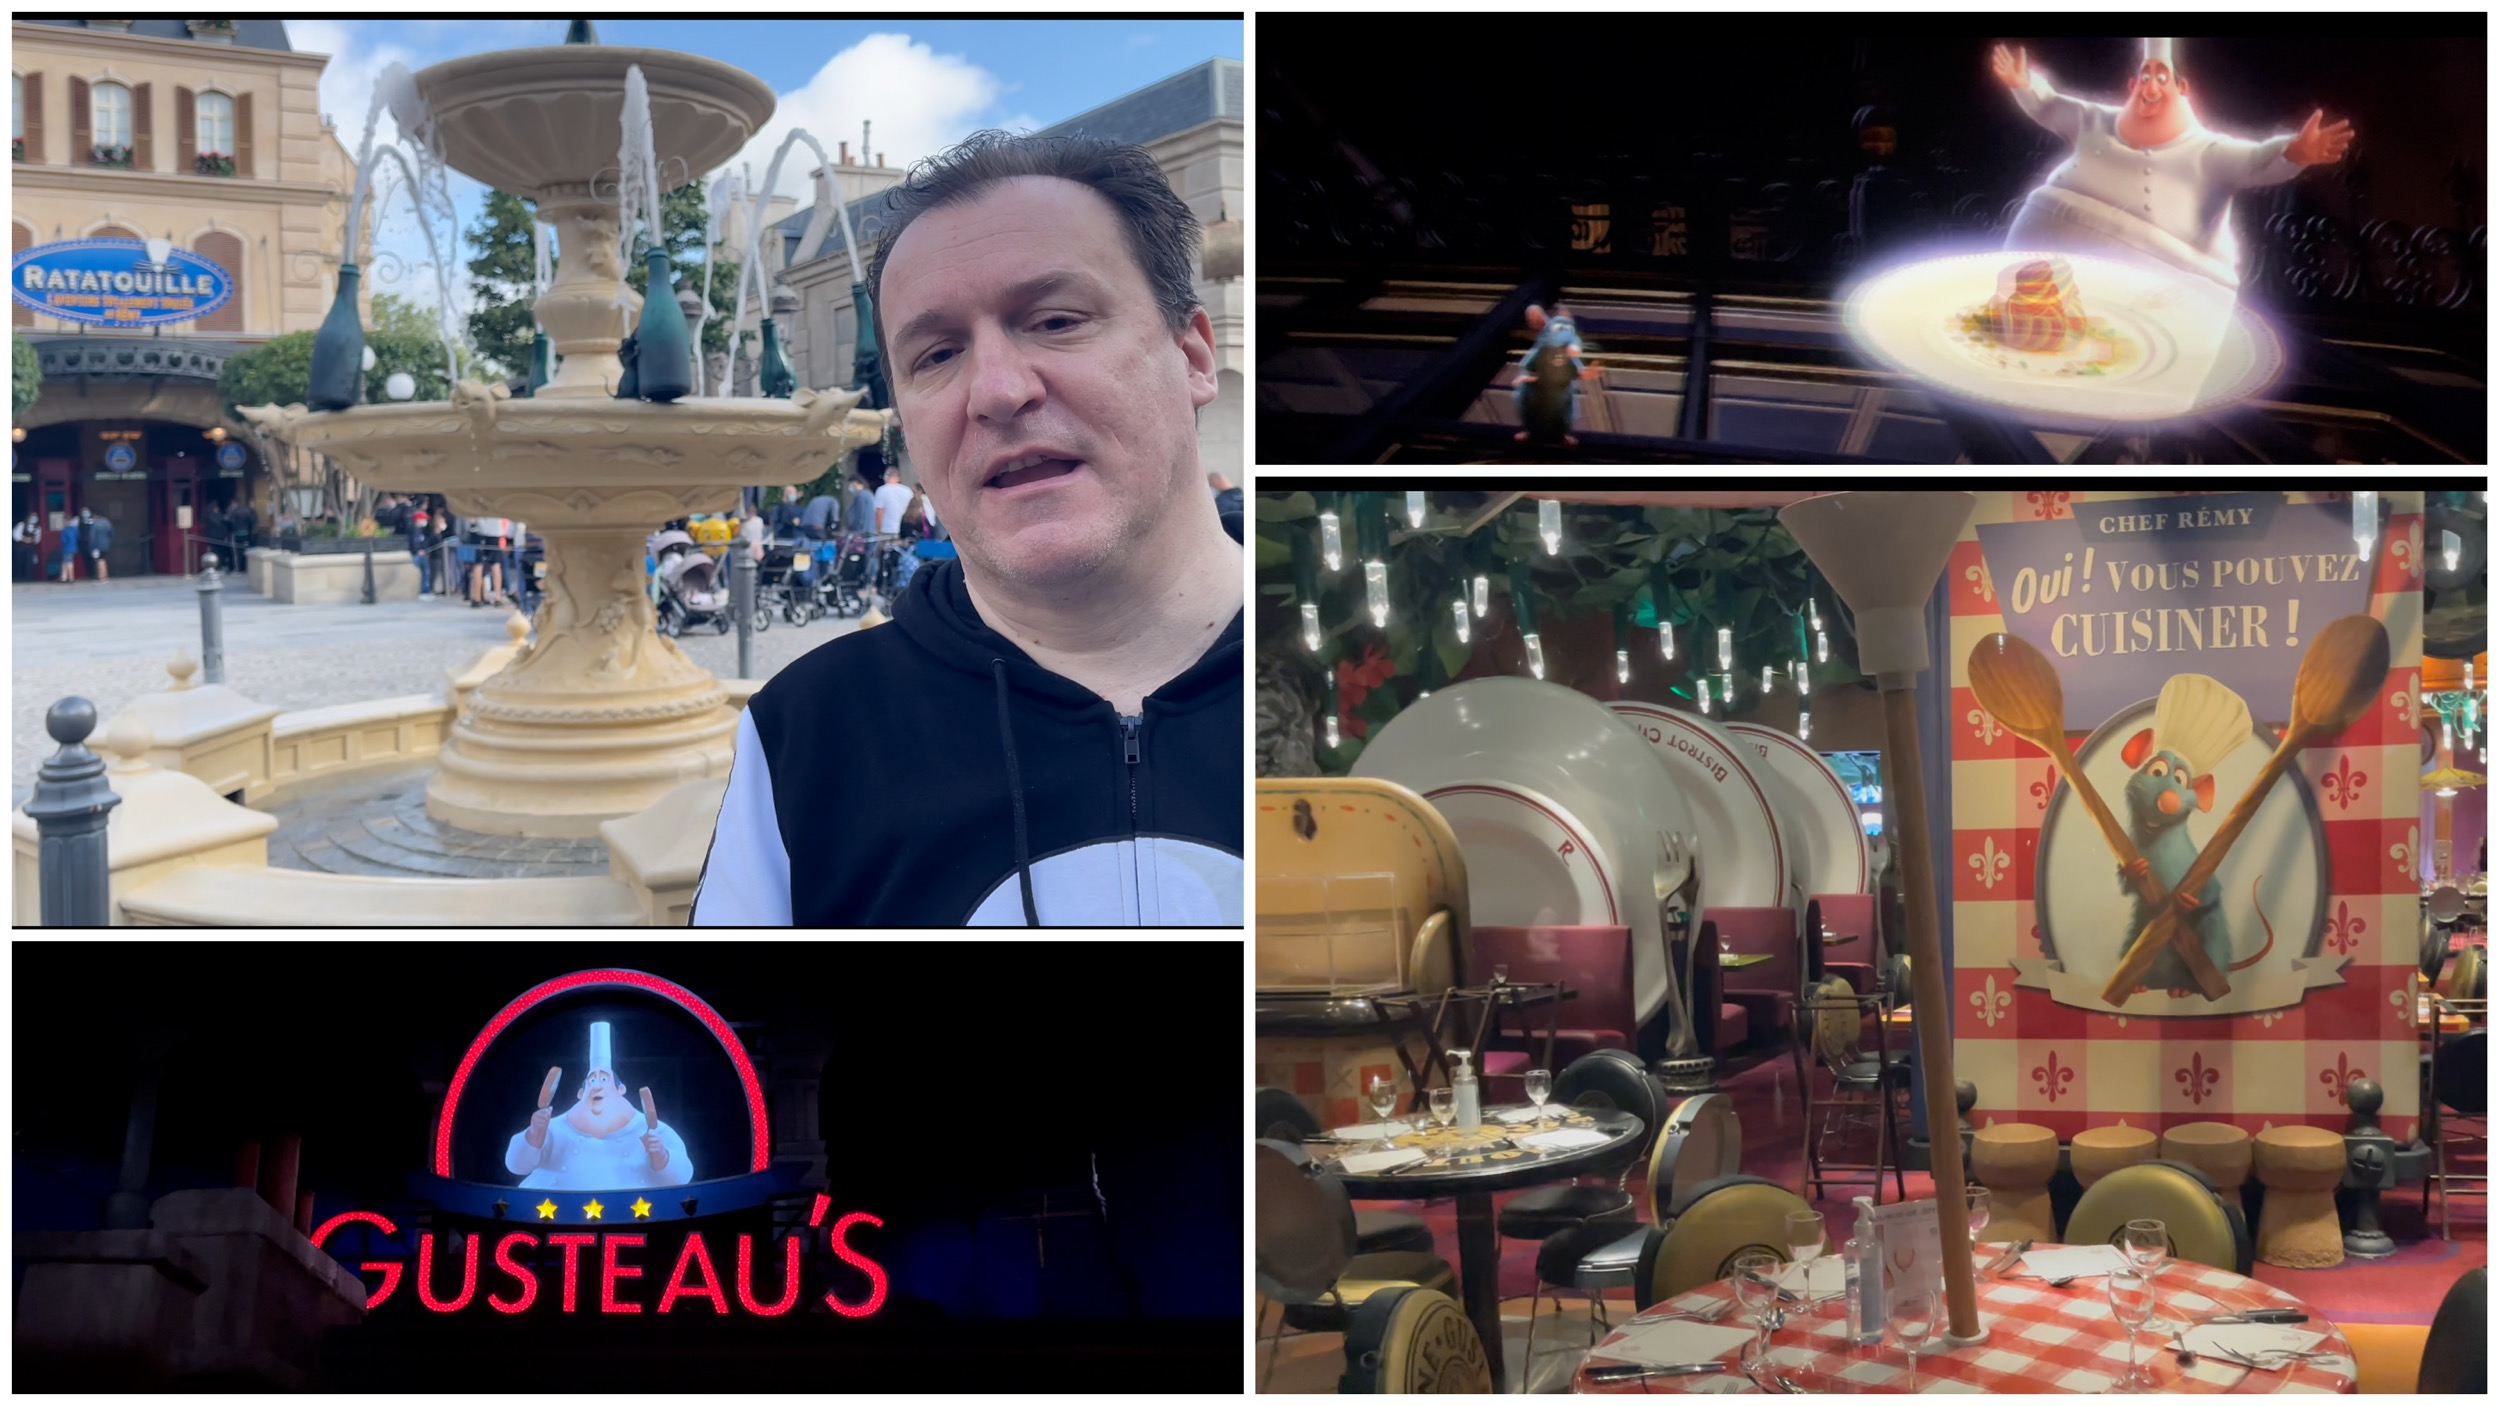 Željko Pantić: Specijal Disneyland Paris. Specijalna 4D vožnja i kvart posvećen filmu Ratatouille (VIDEO)